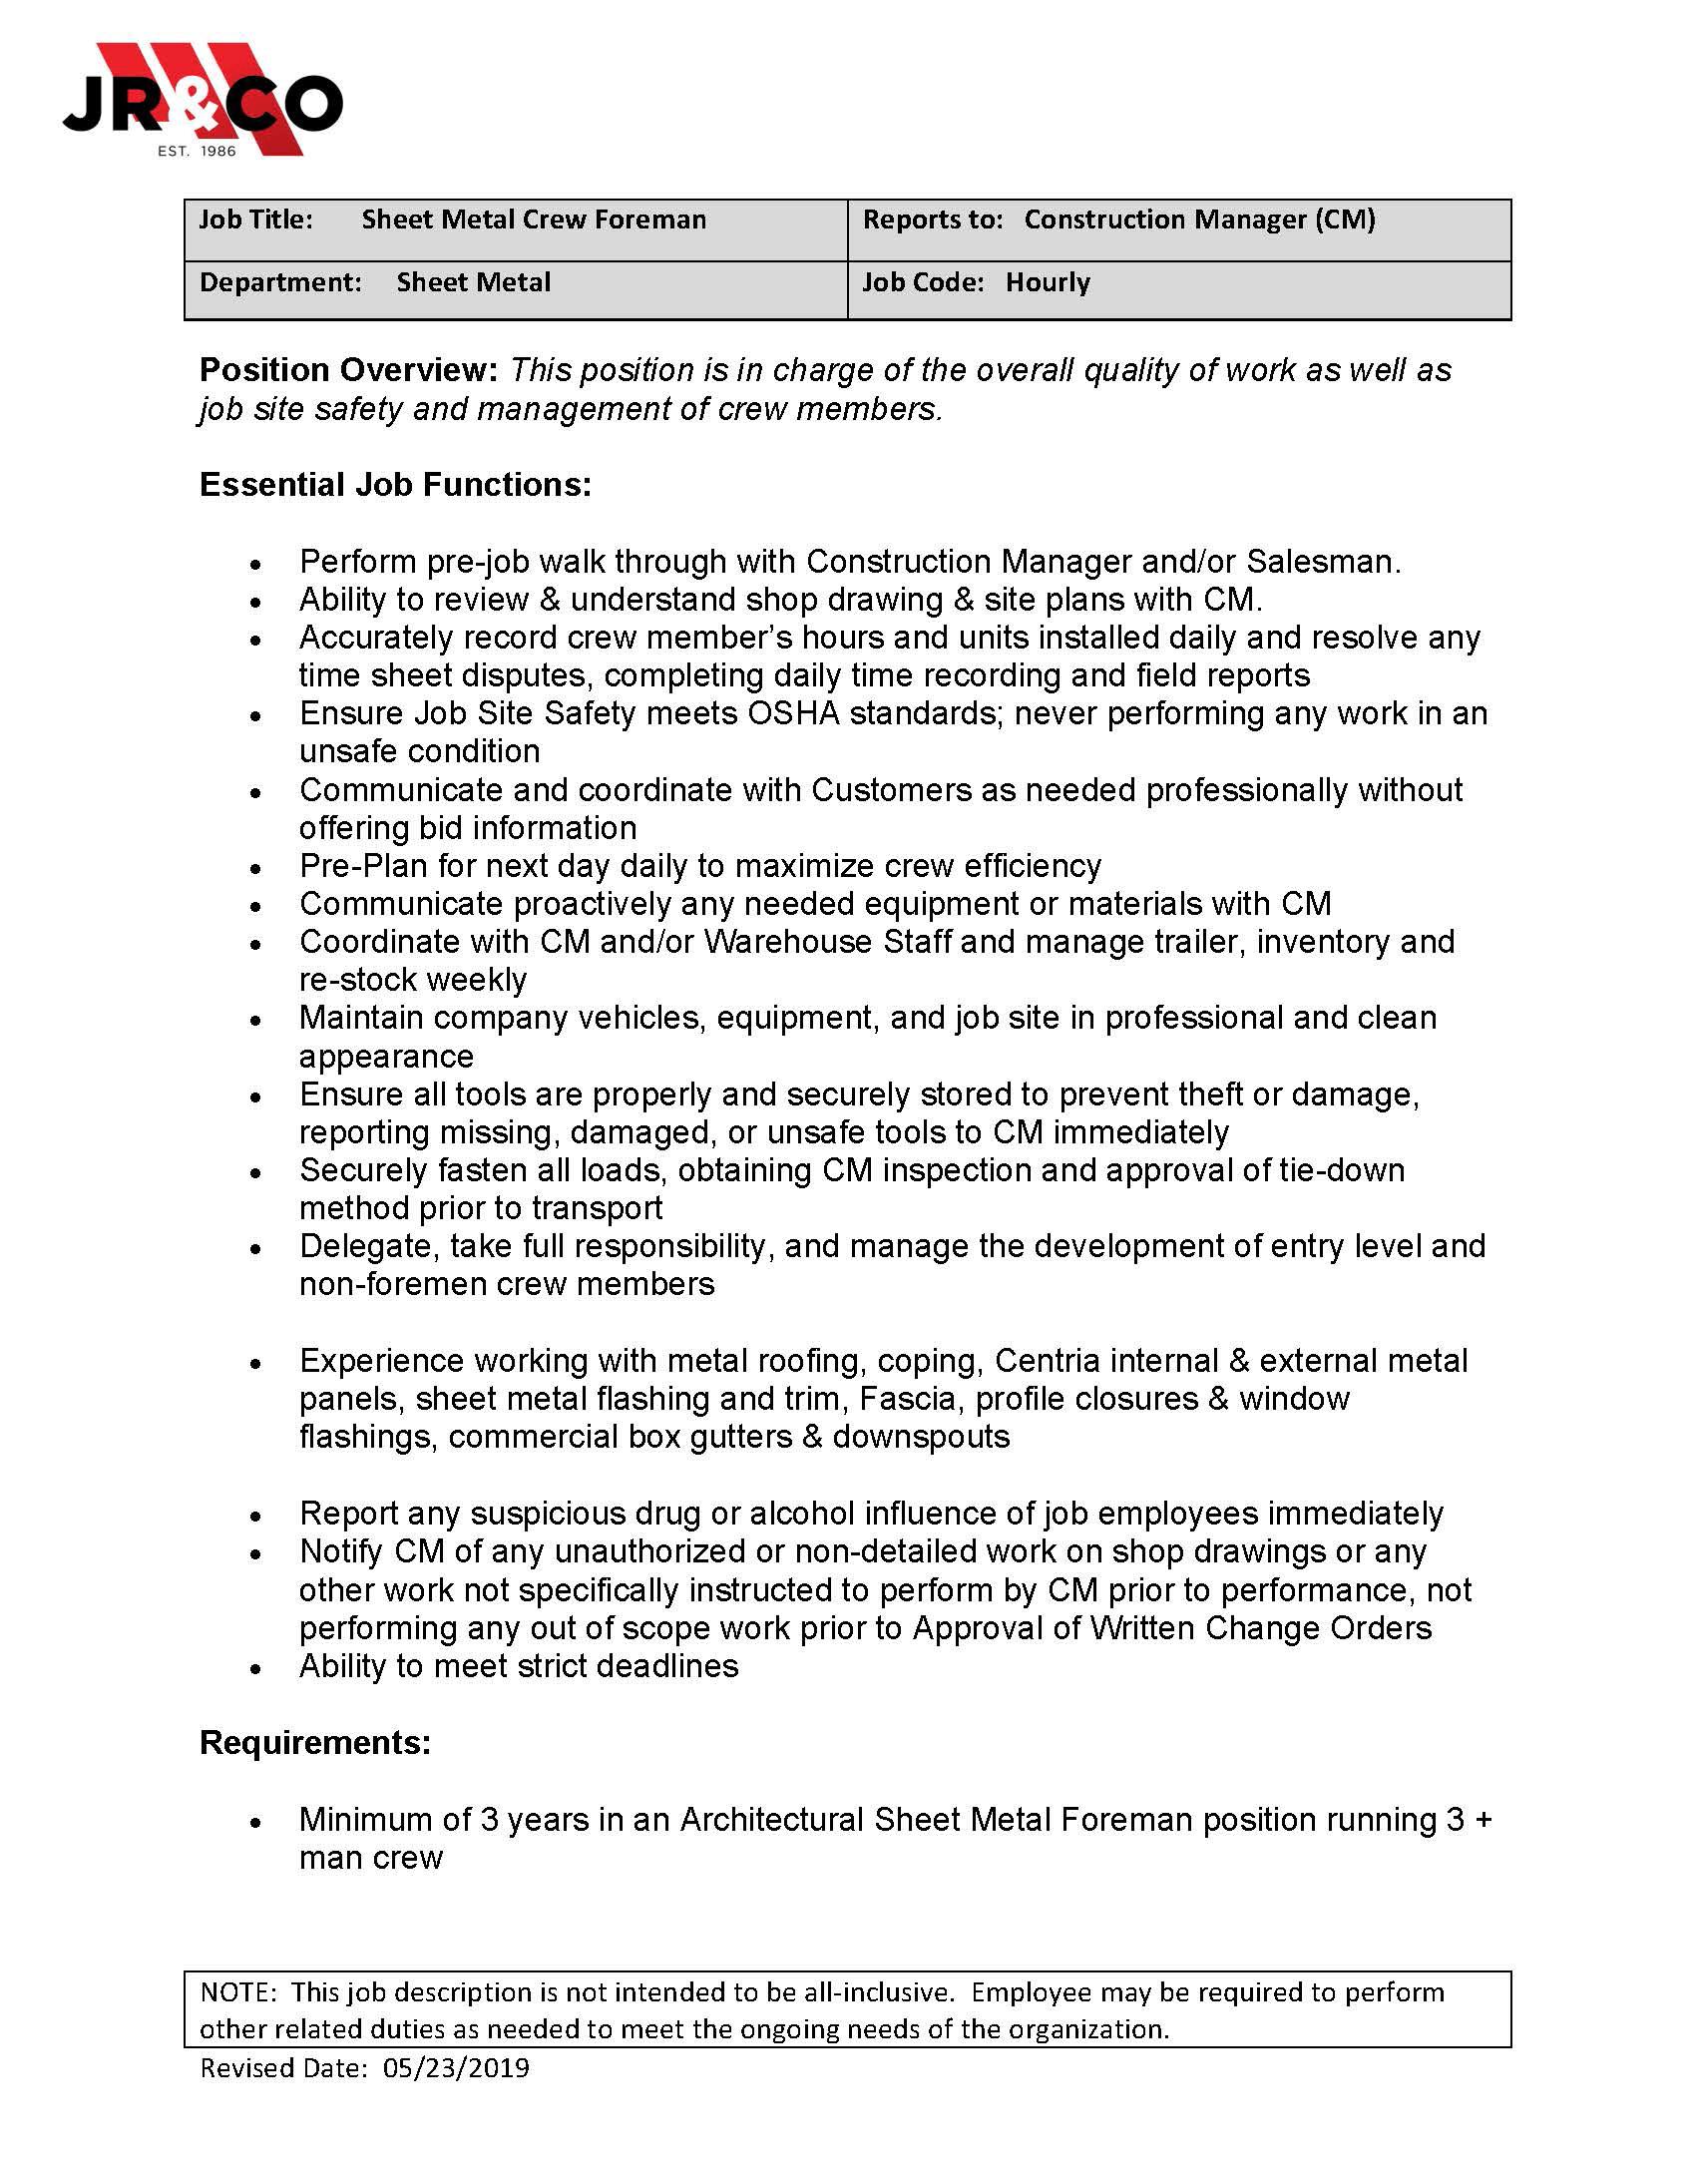 JR & CO - Apply: SMH Crew Forman